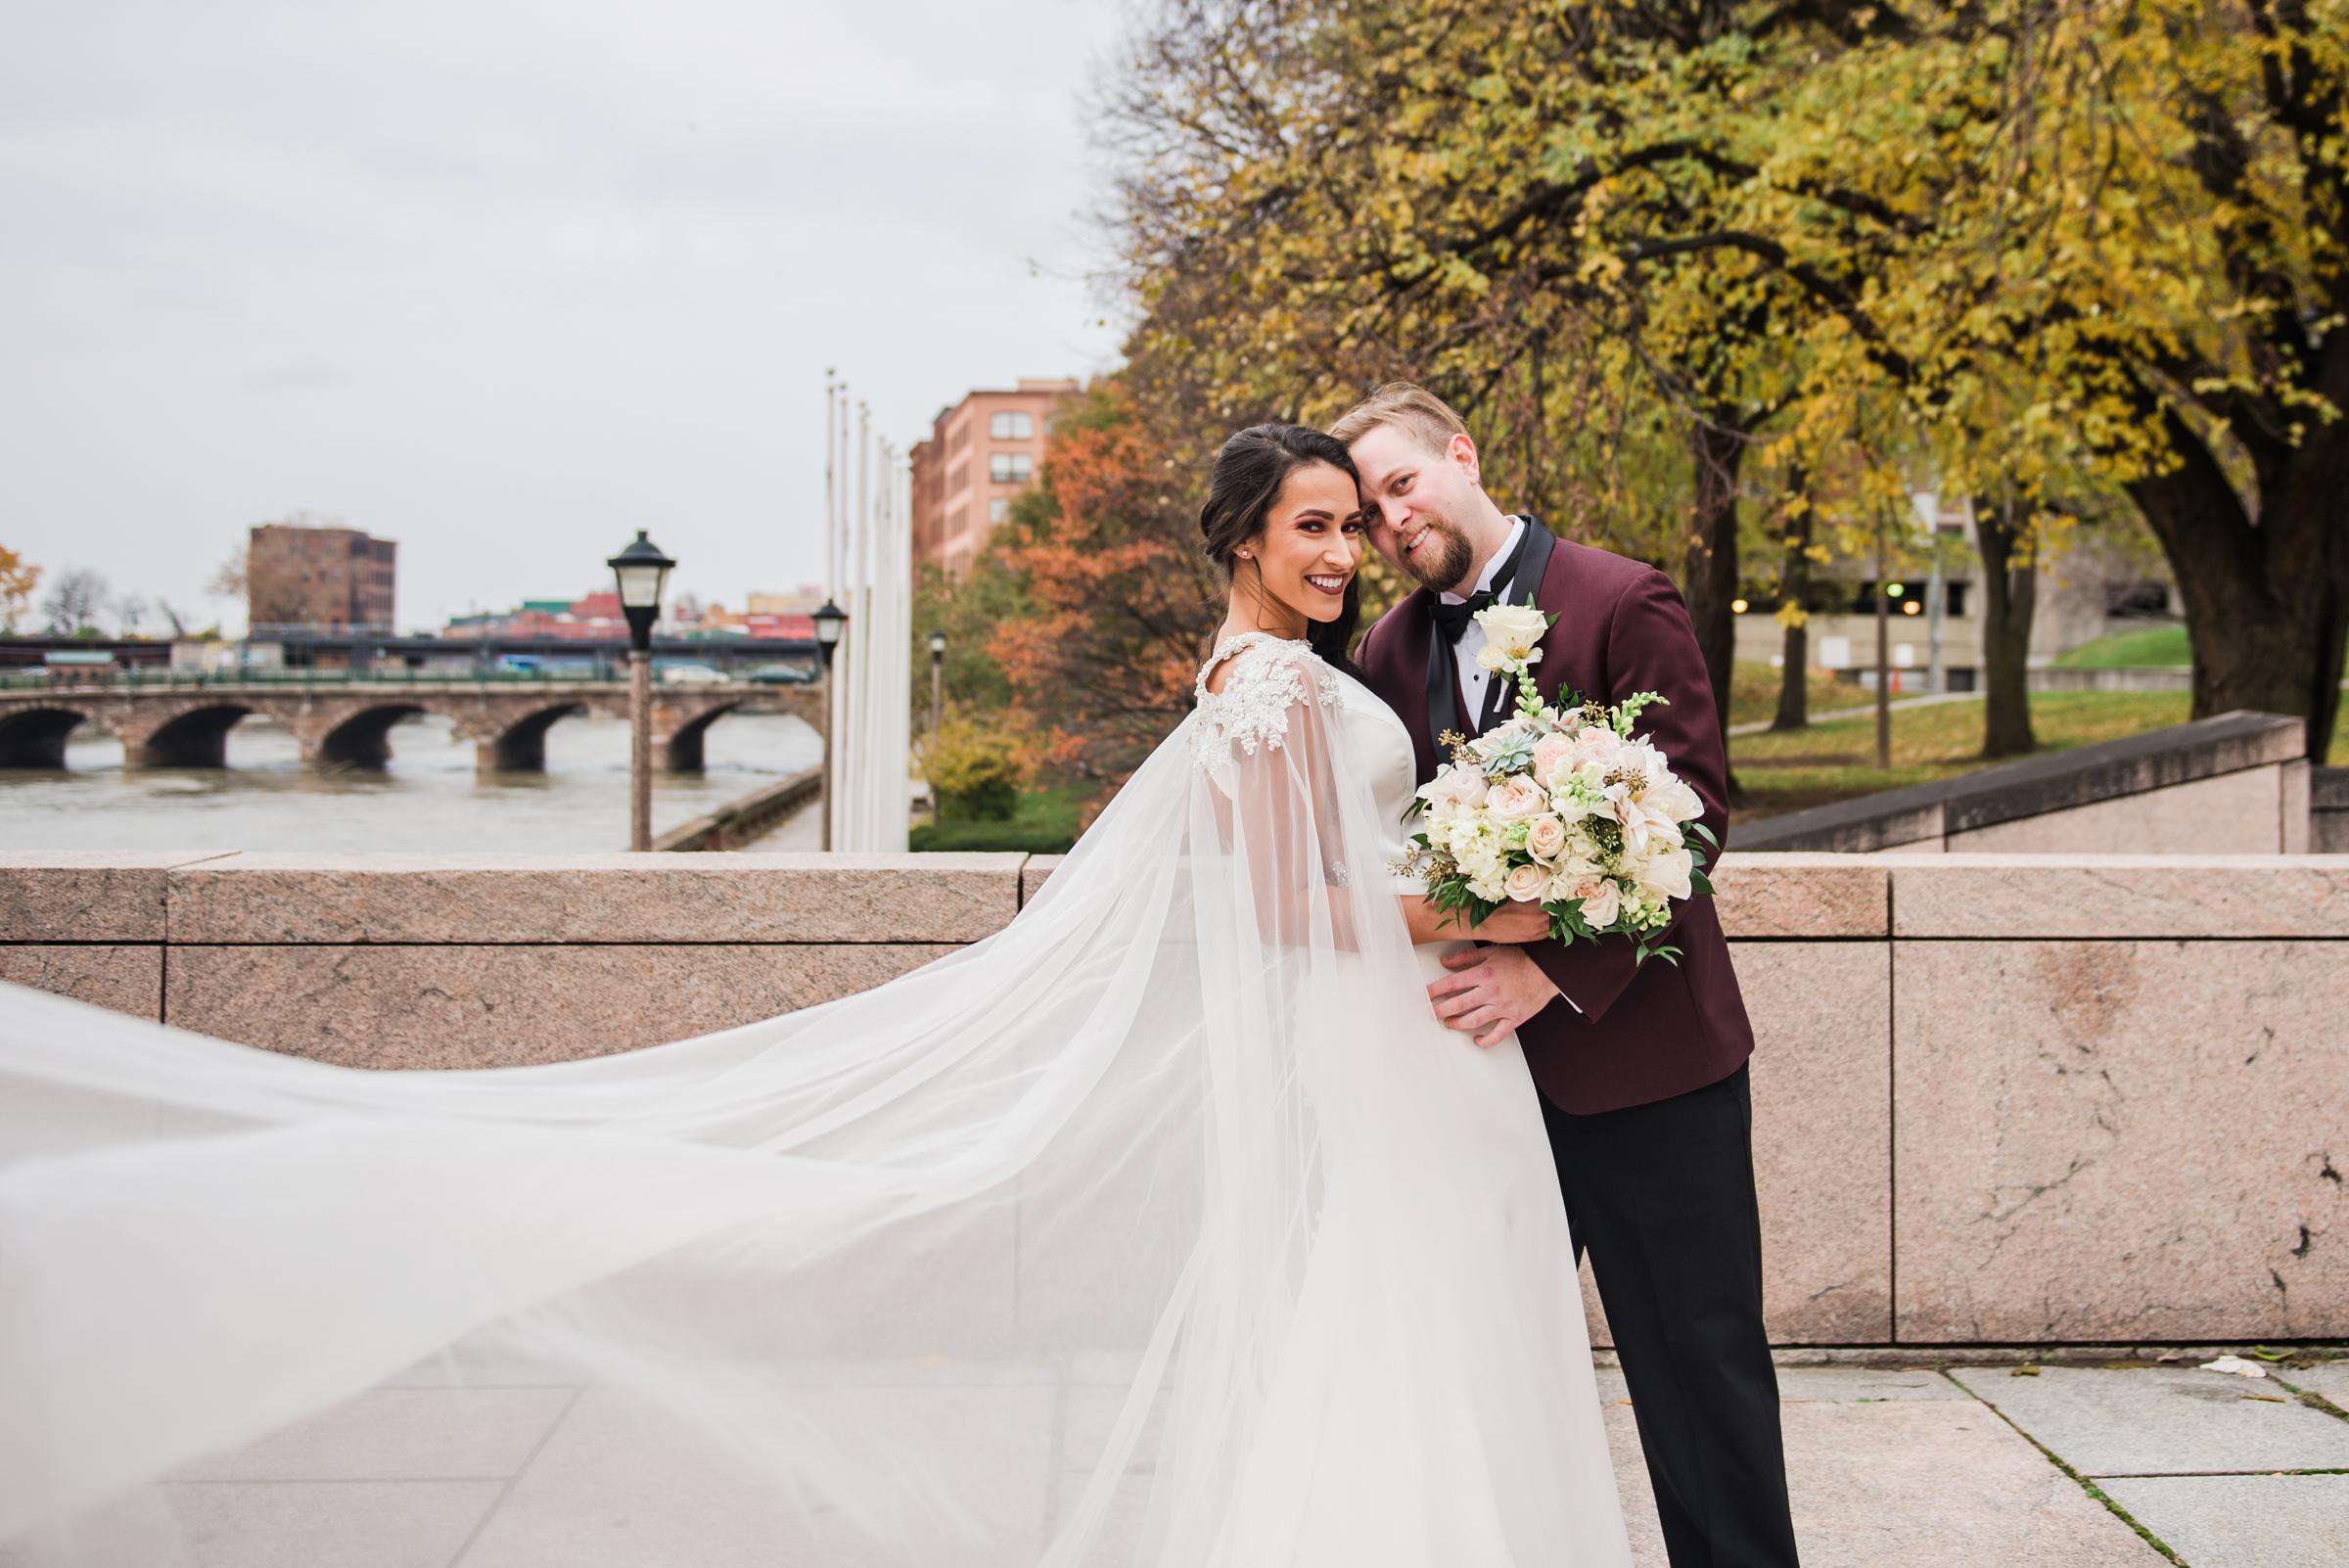 Wintergarden_by_Monroes_Rochester_Wedding_JILL_STUDIO_Rochester_NY_Photographer_164029.jpg